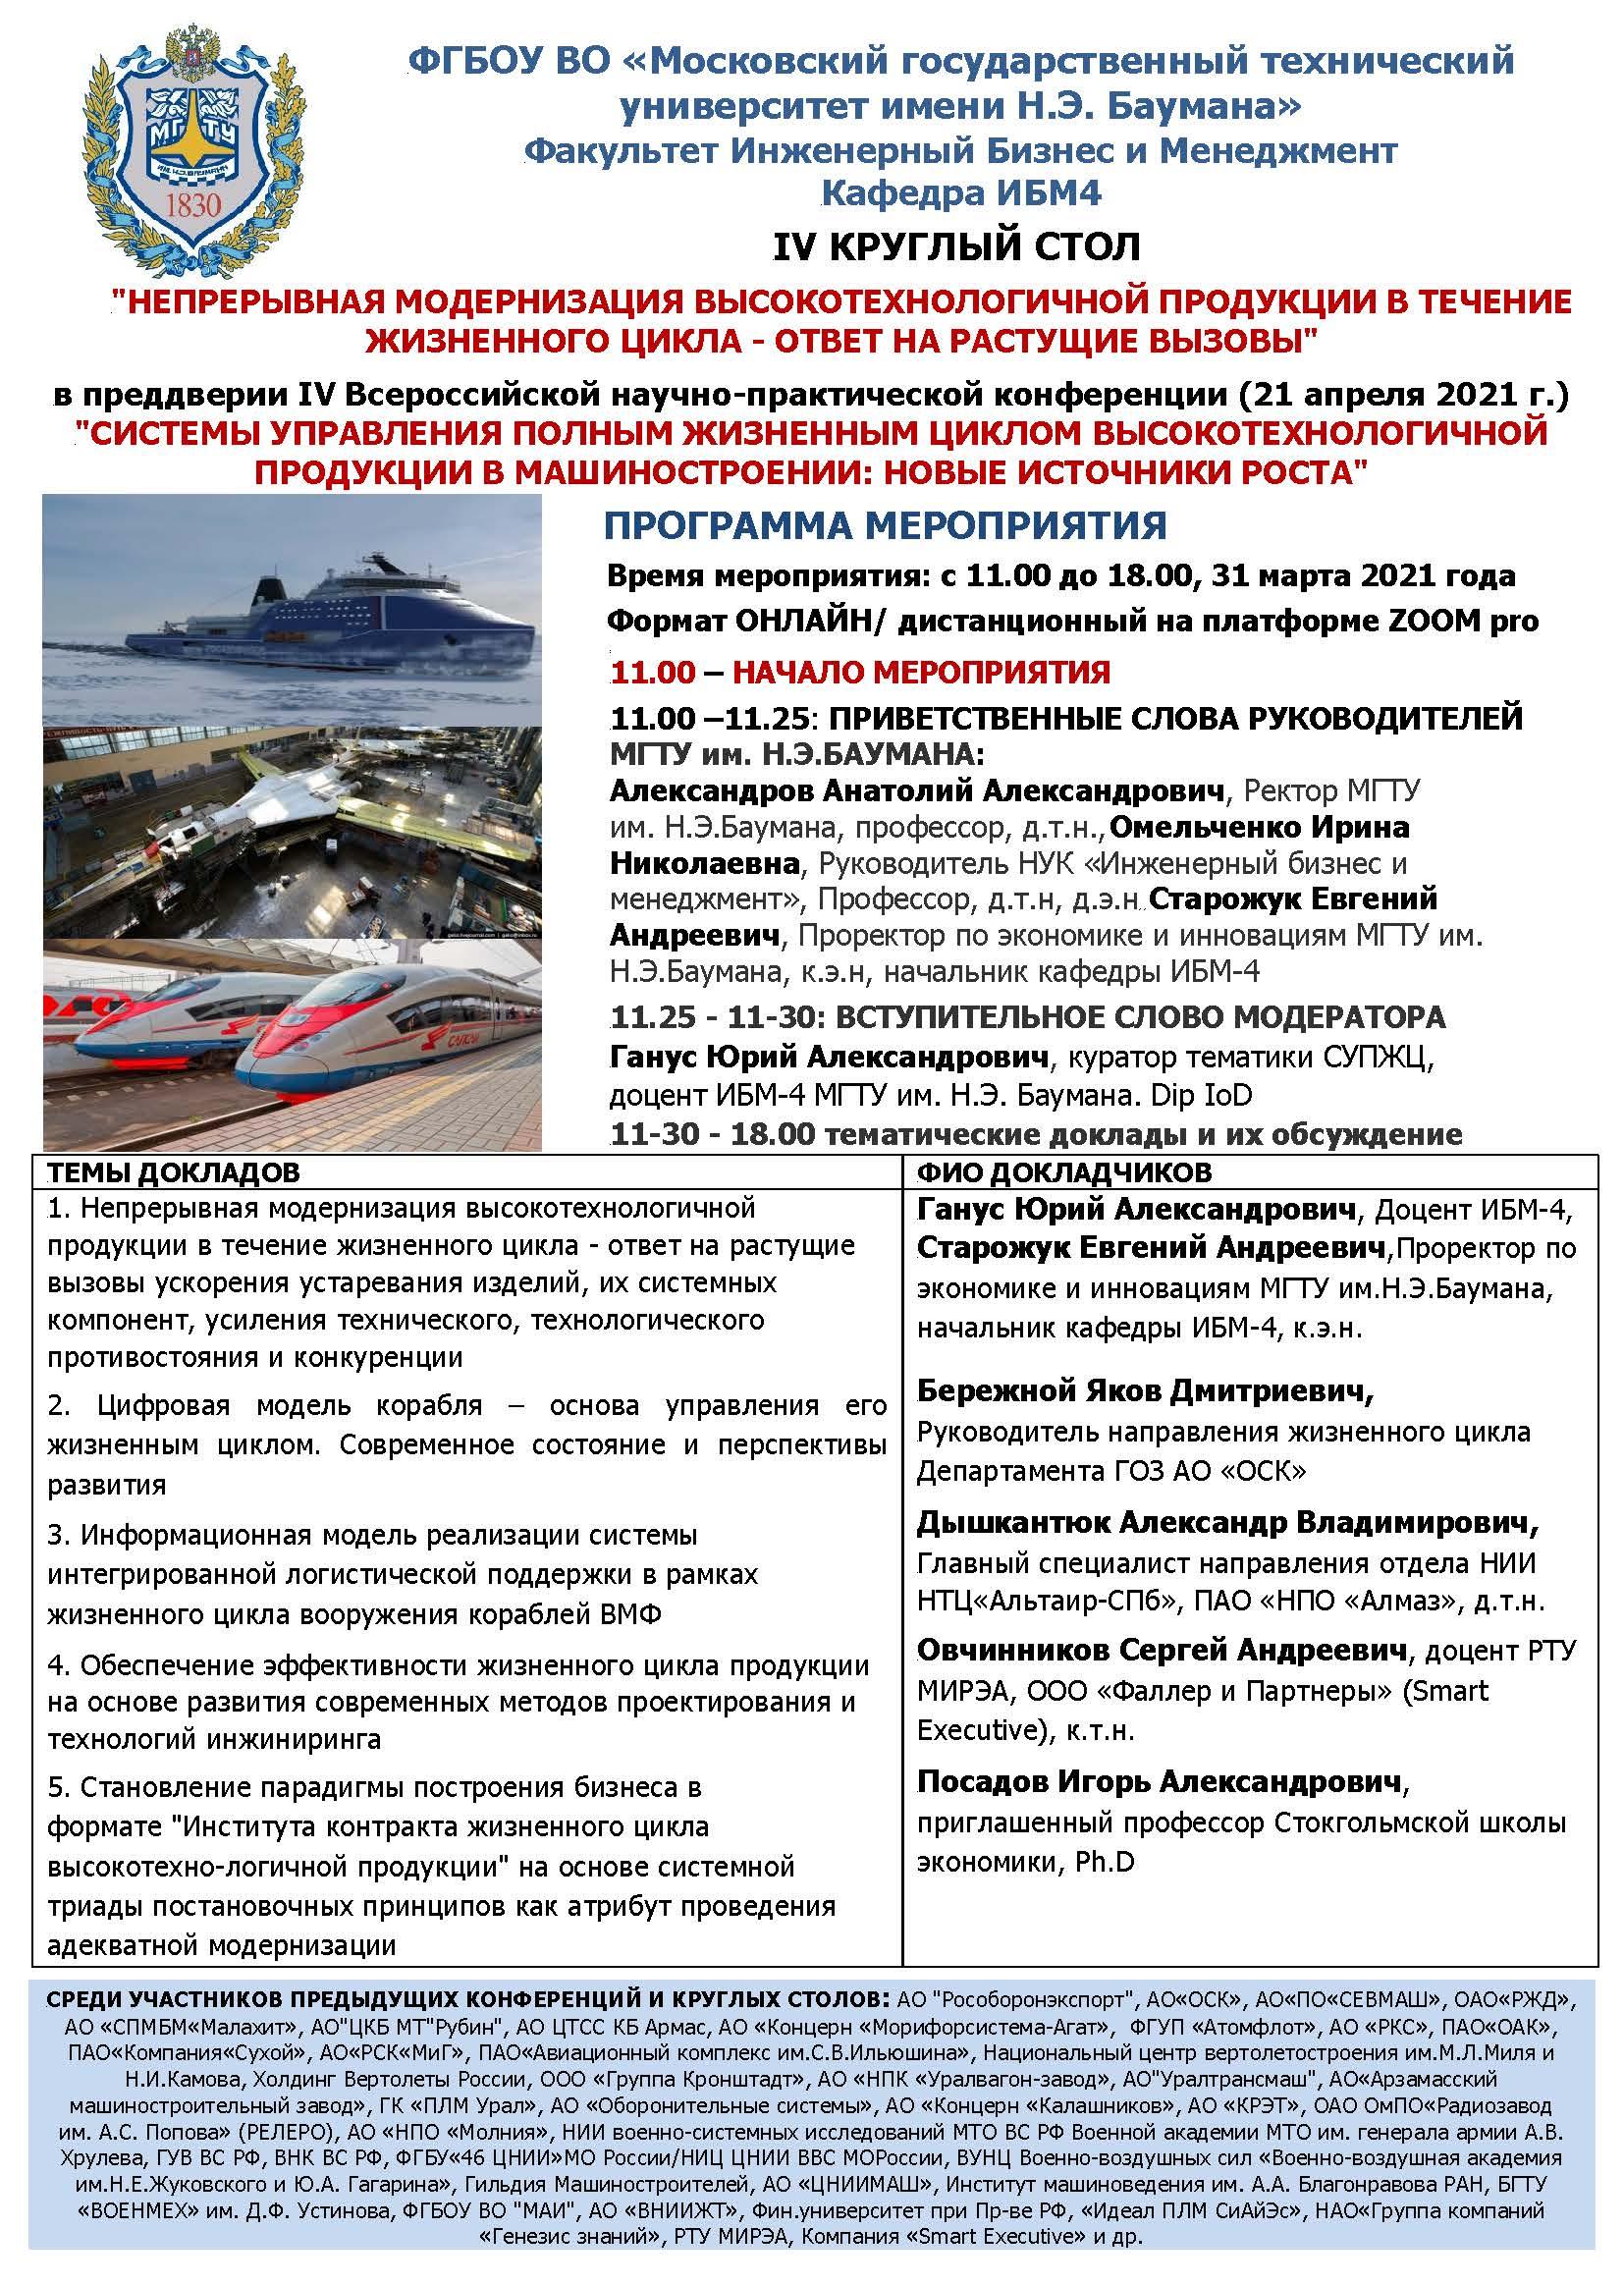 ГанусЮА ПРОГРАММА МГТУ КруглыйСтол СУПЖЦ 310321 Страница New2